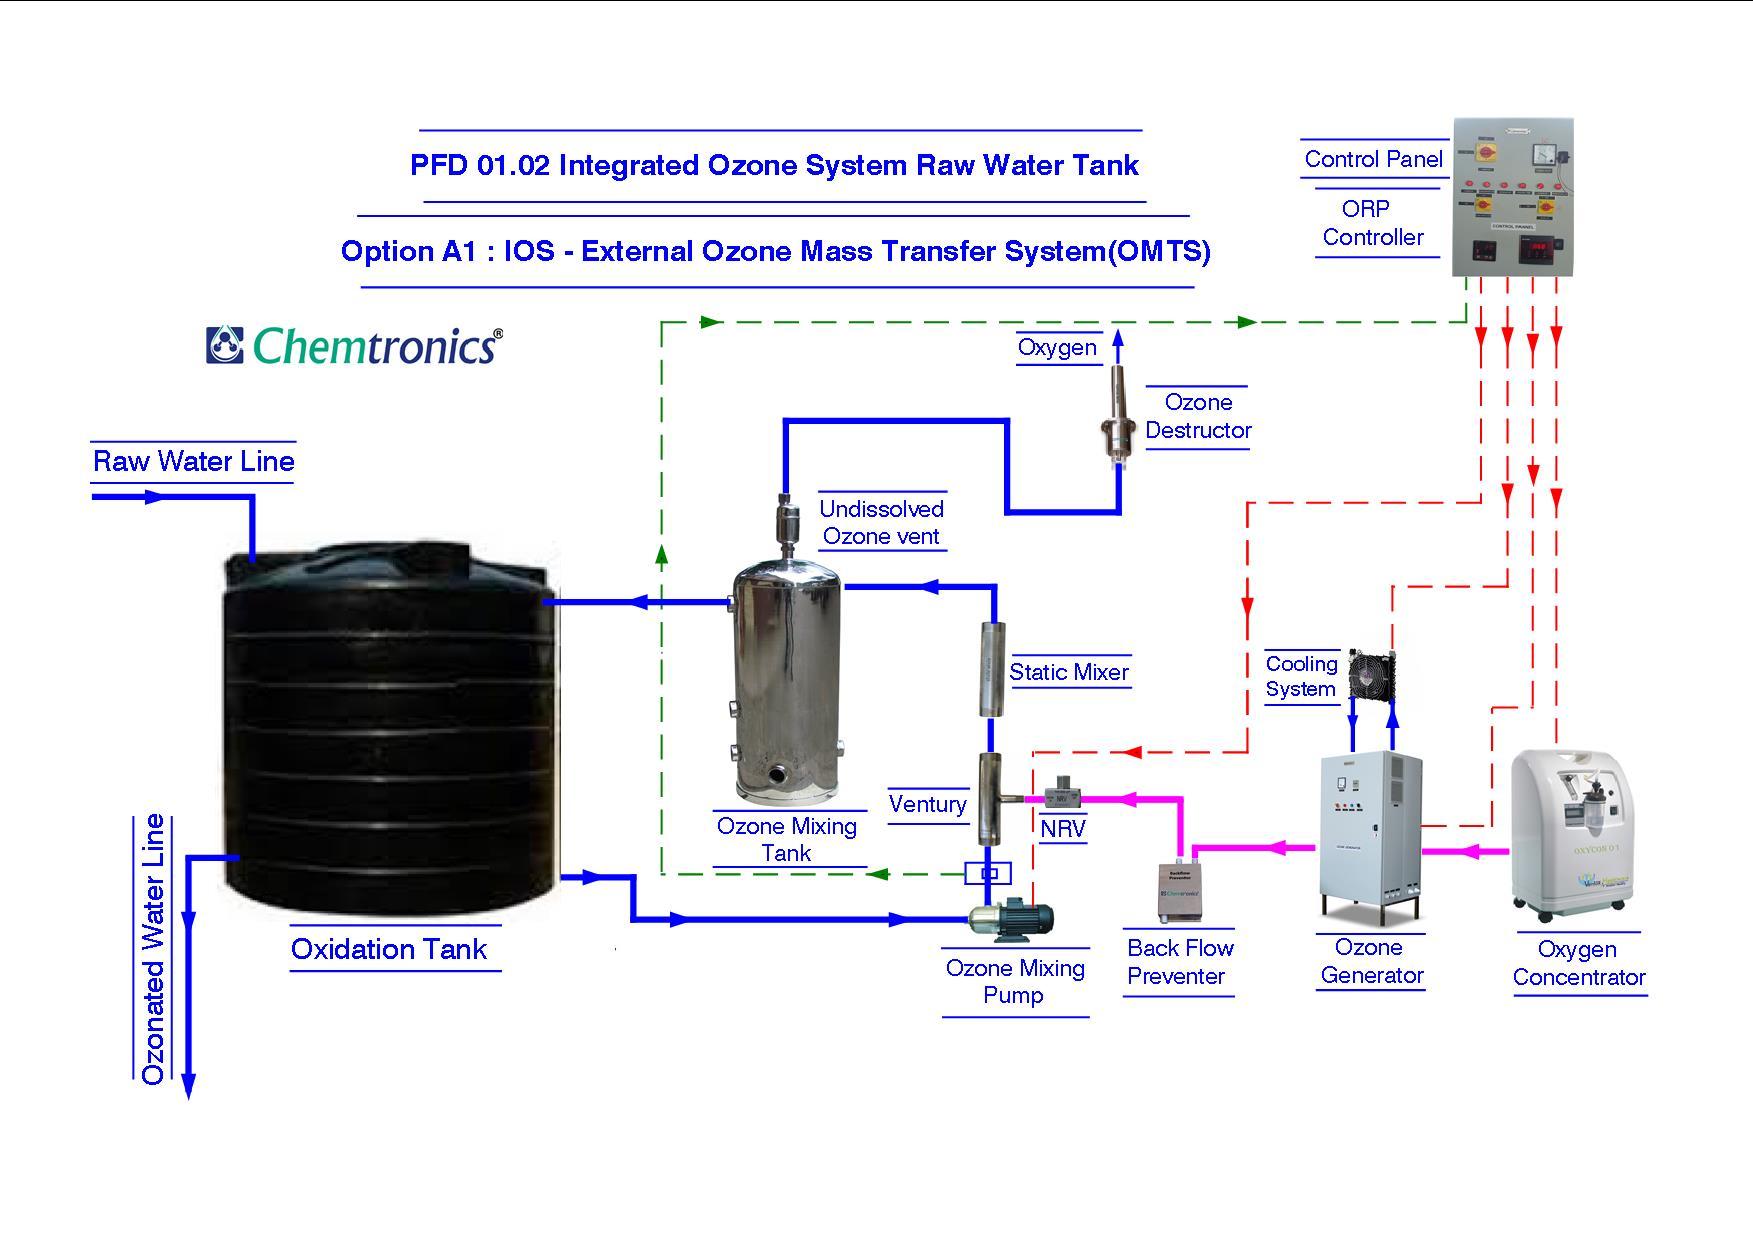 pool orp diagram wiring diagrams